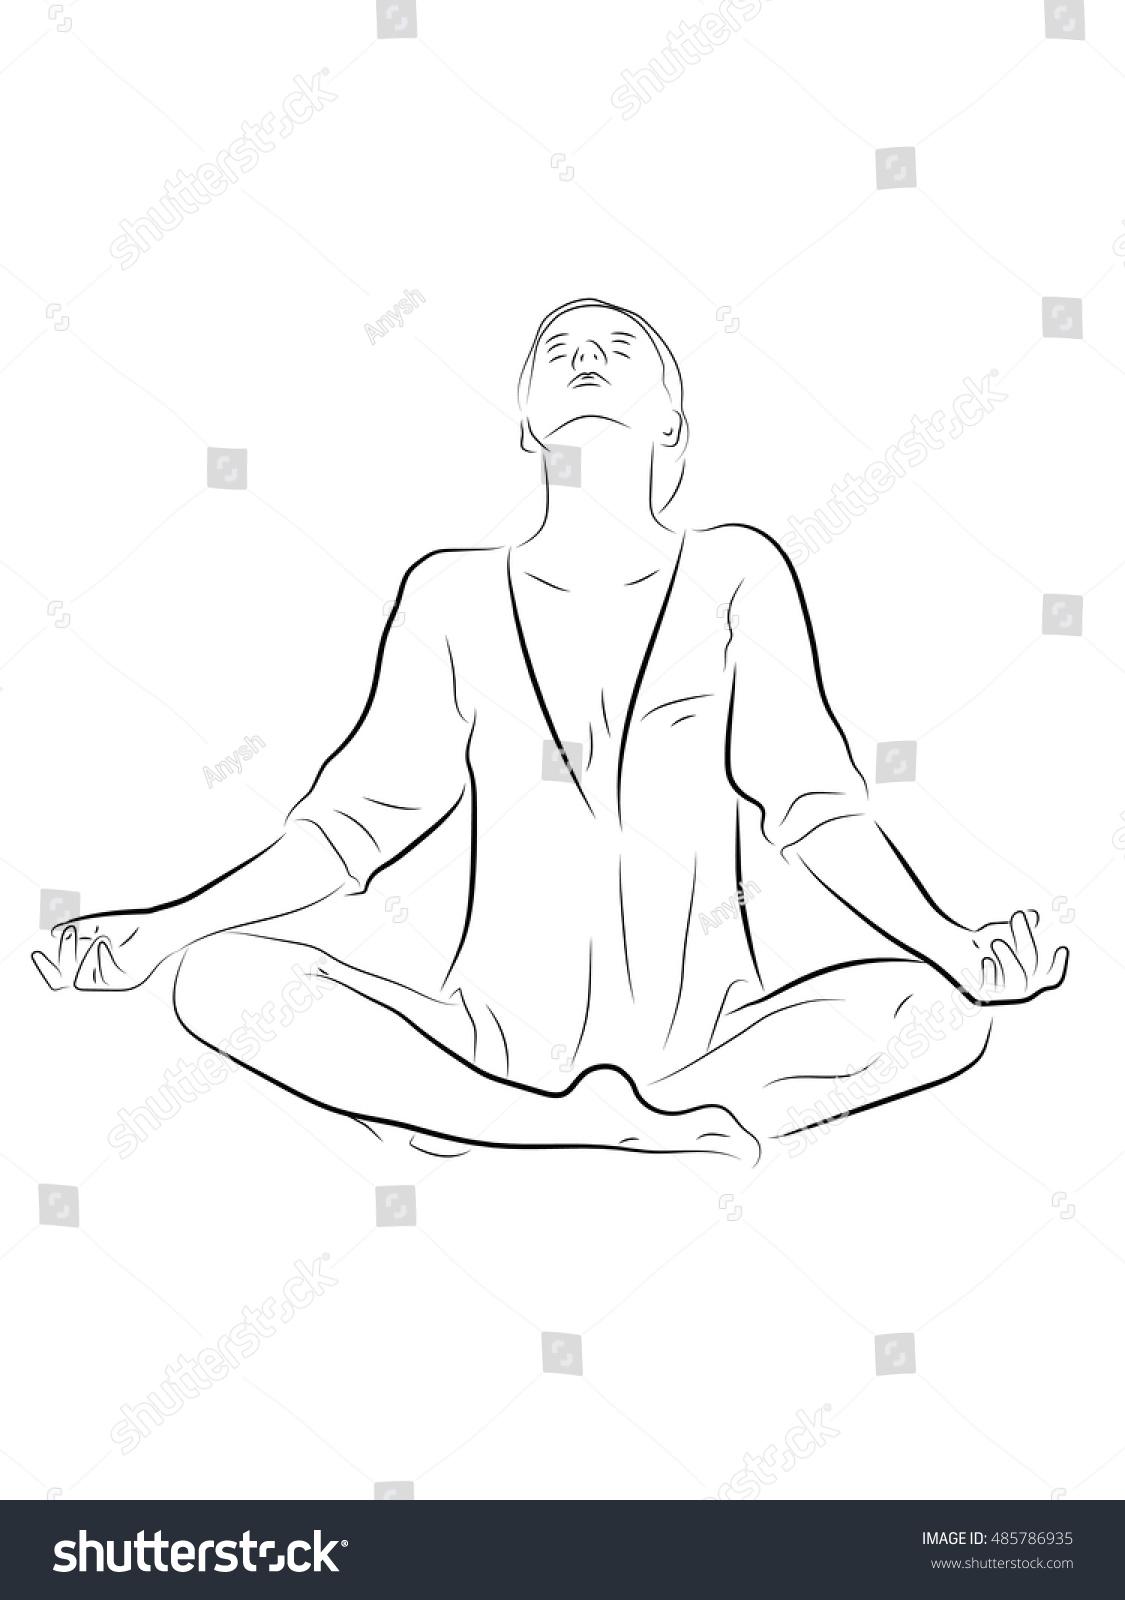 Woman Sitting Meditating Posture Pencil Drawing Stock Vector Royalty Free 485786935